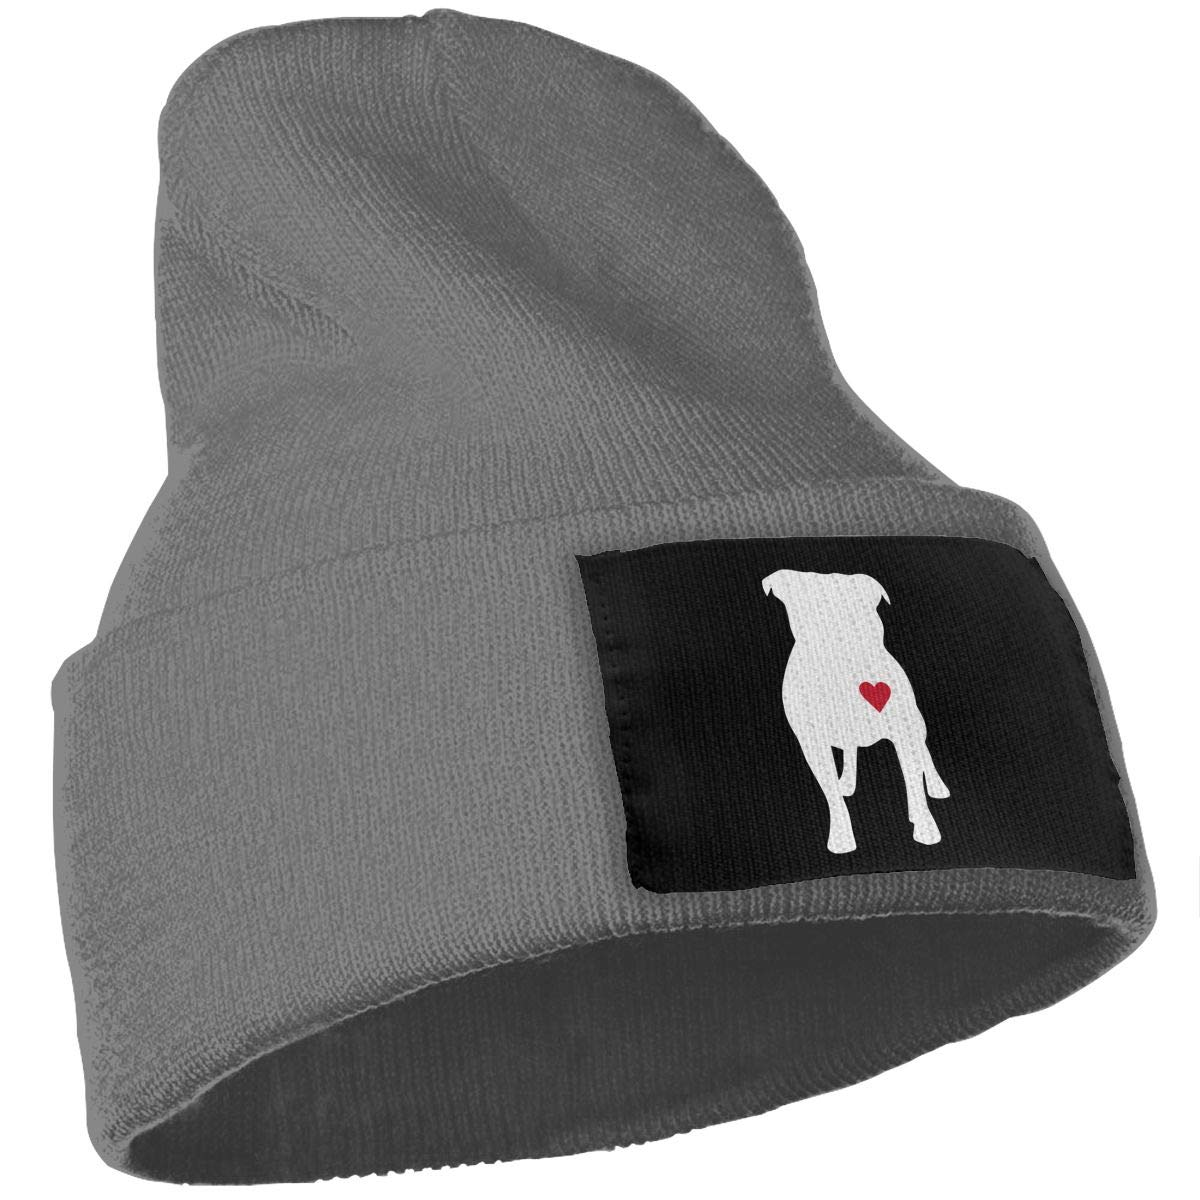 COLLJL-8 Men /& Women Pitbull Heart Outdoor Stretch Knit Beanies Hat Soft Winter Knit Caps